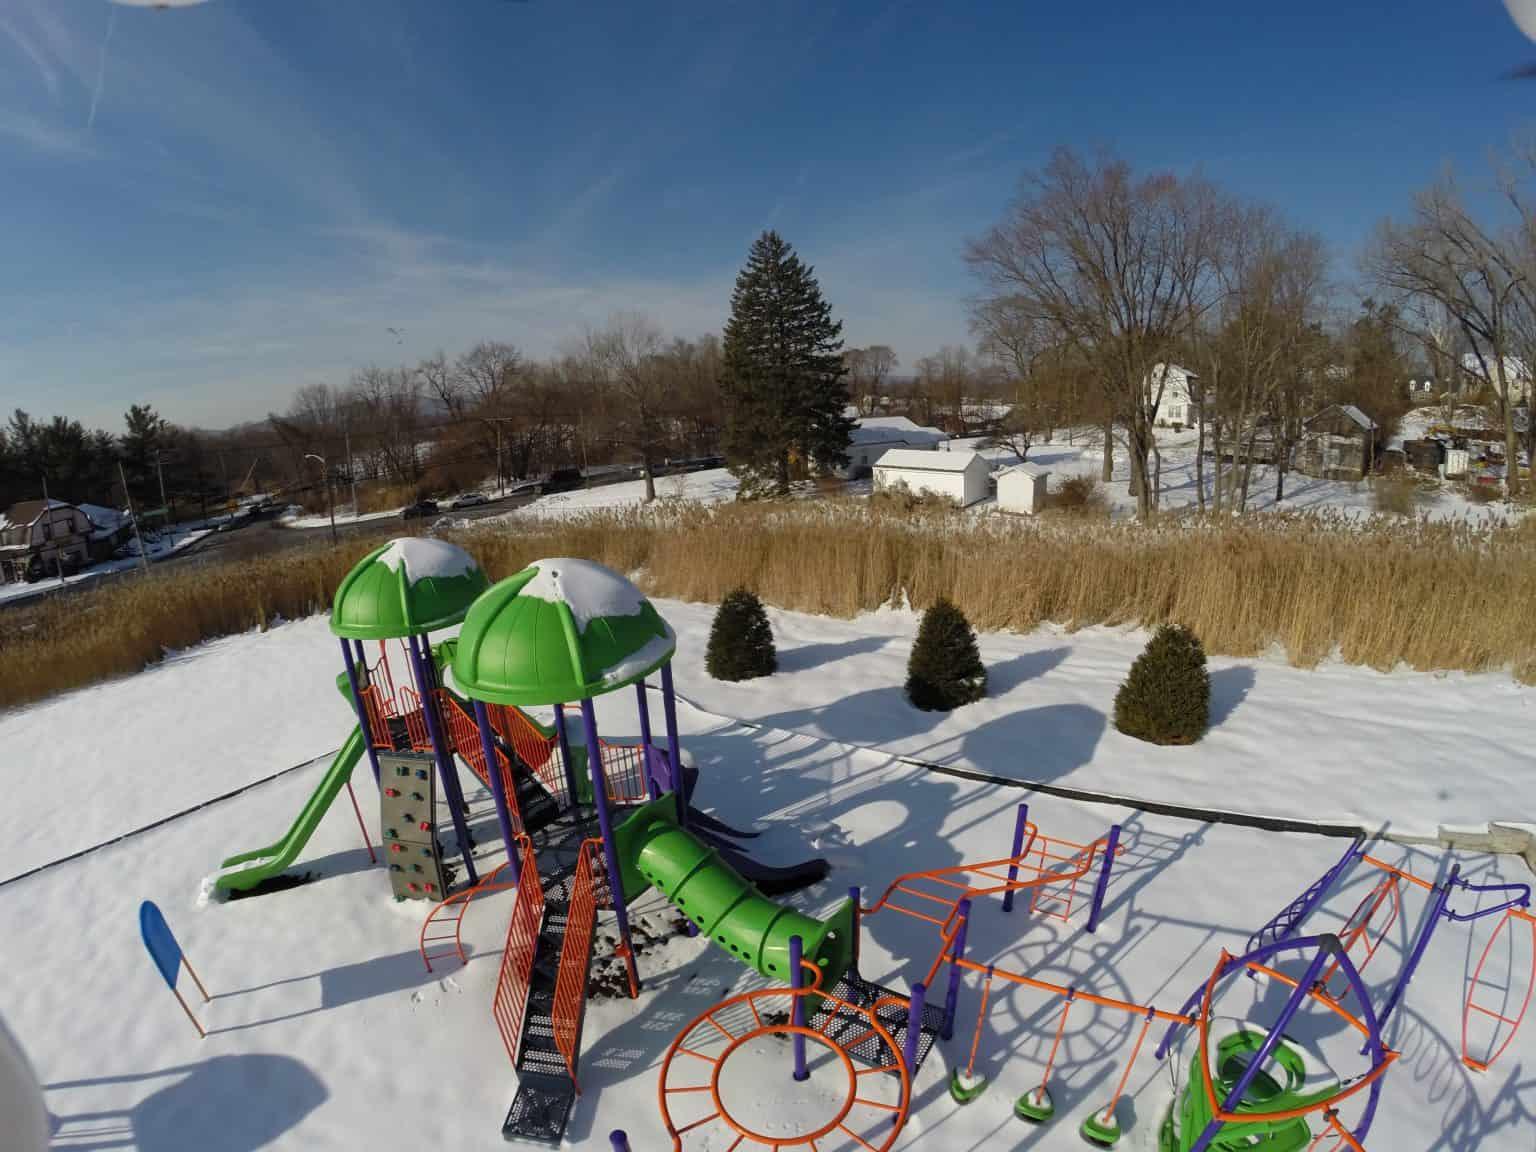 wiss-park-playground-wayne-nj_11652963964_o-1536x1152